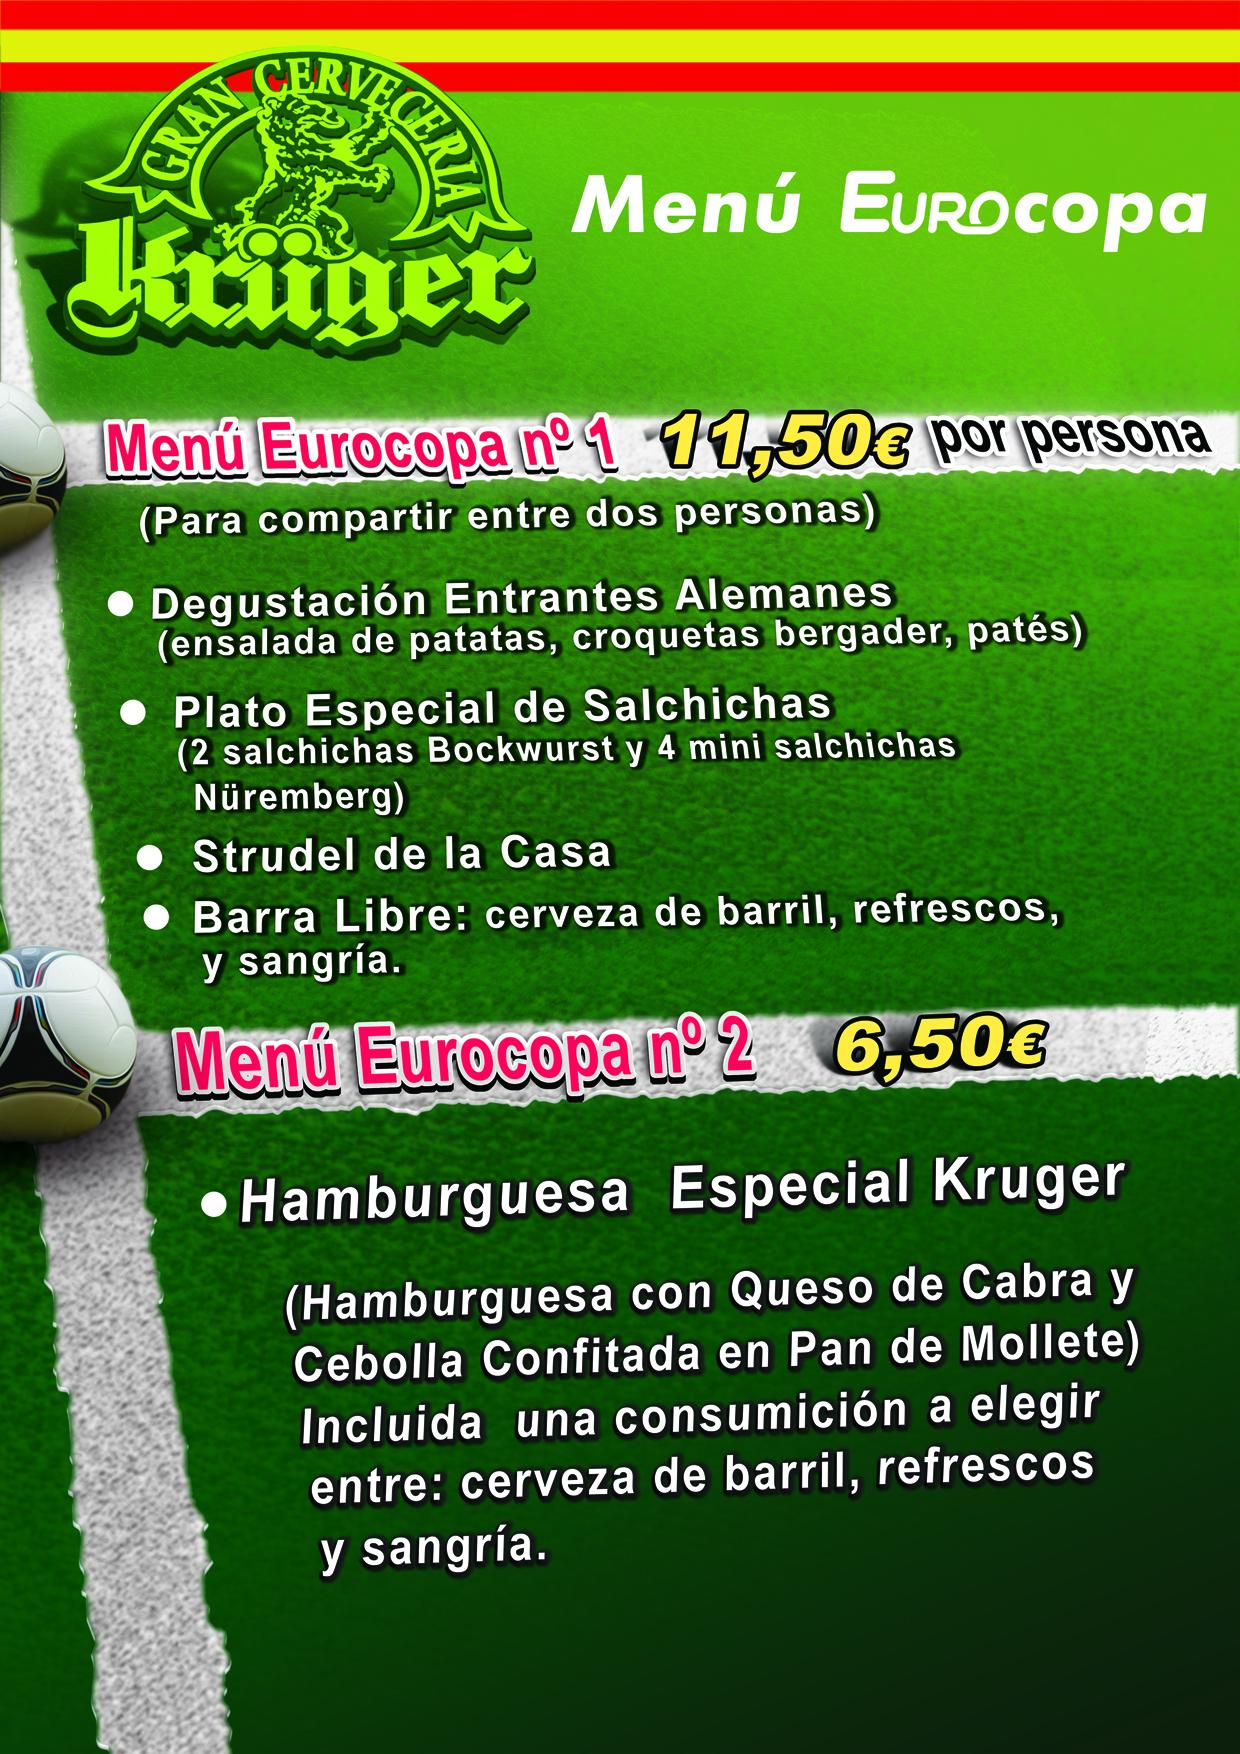 Menu kruger Eurocopa 2012